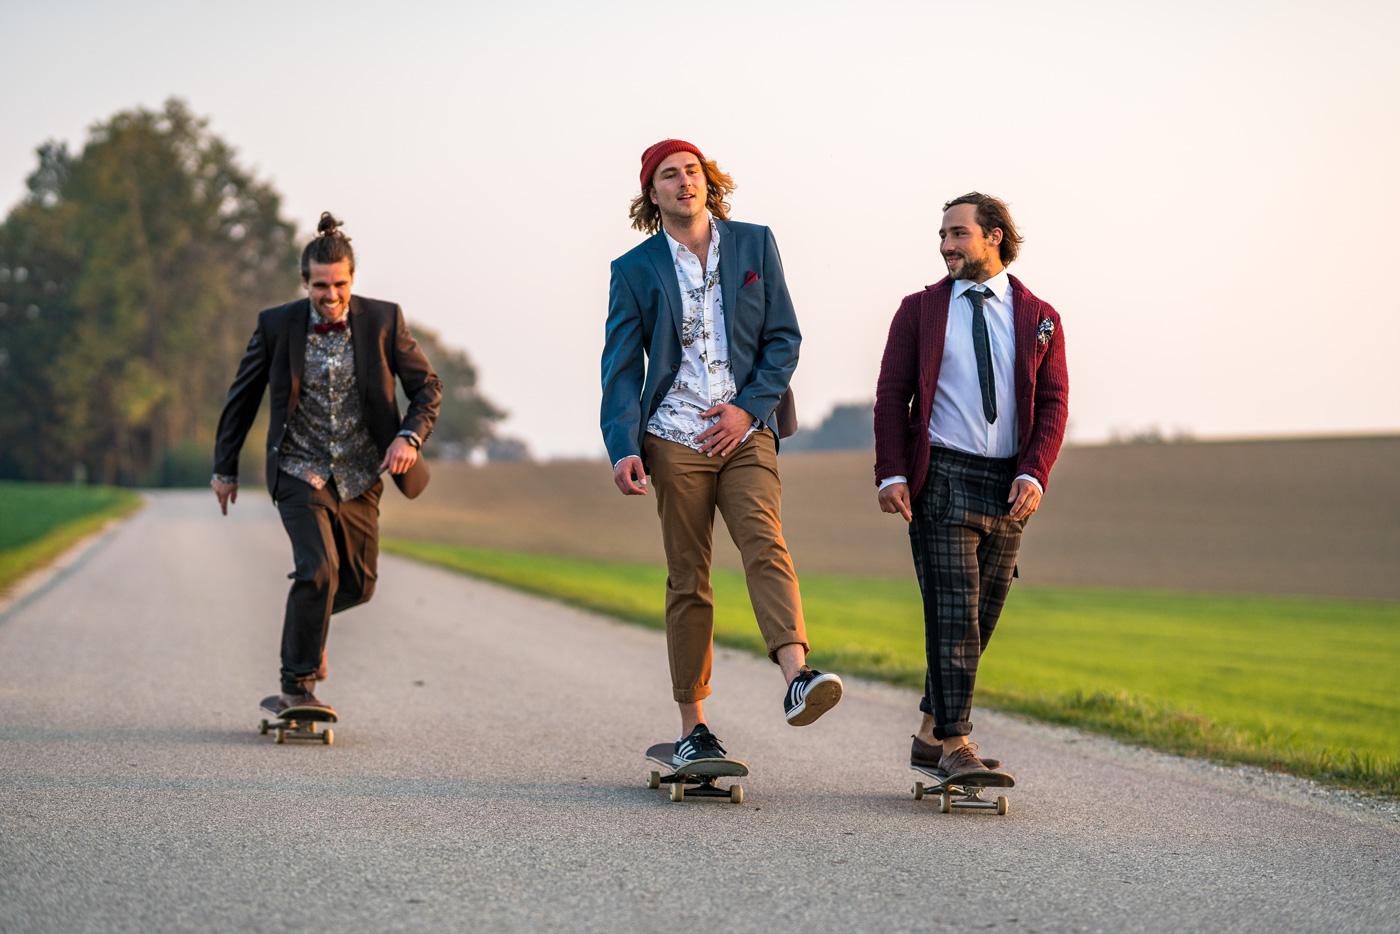 Skate_11